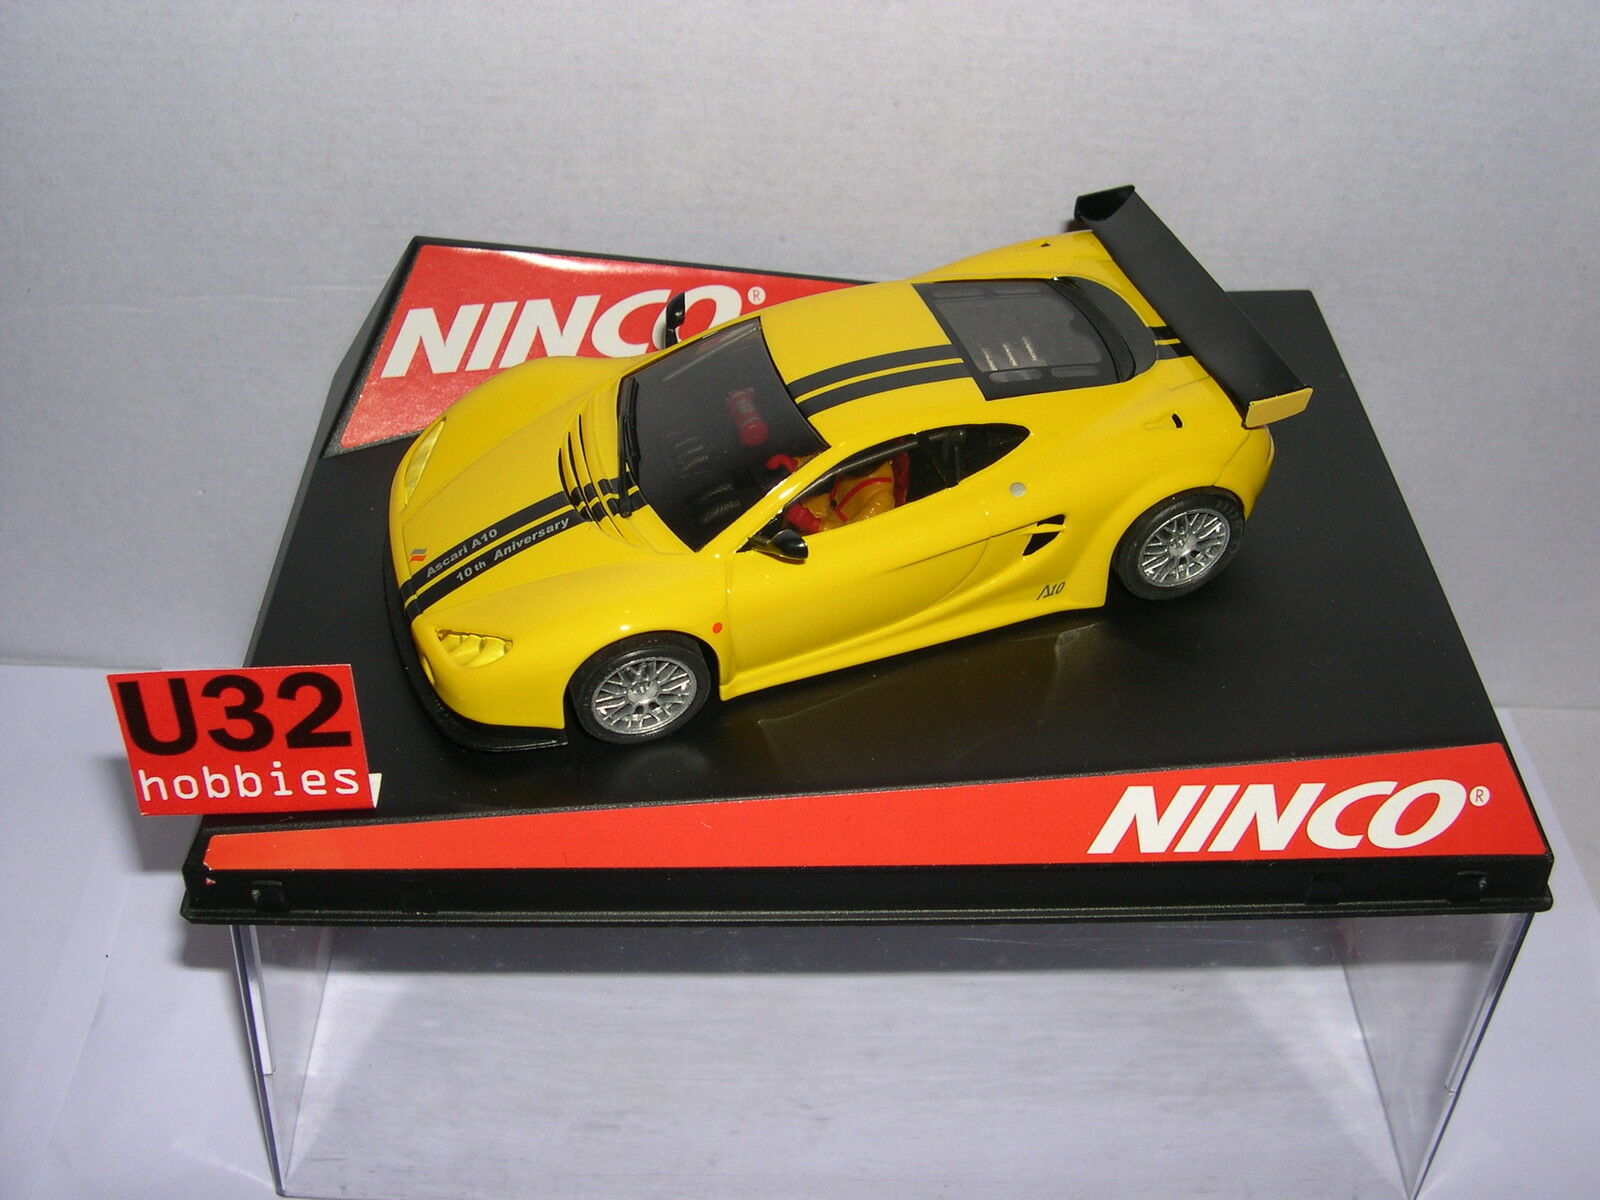 Qq 50458 NINCO ASCARI KZ1 10 ANNIVERSARIO ROAD CAR